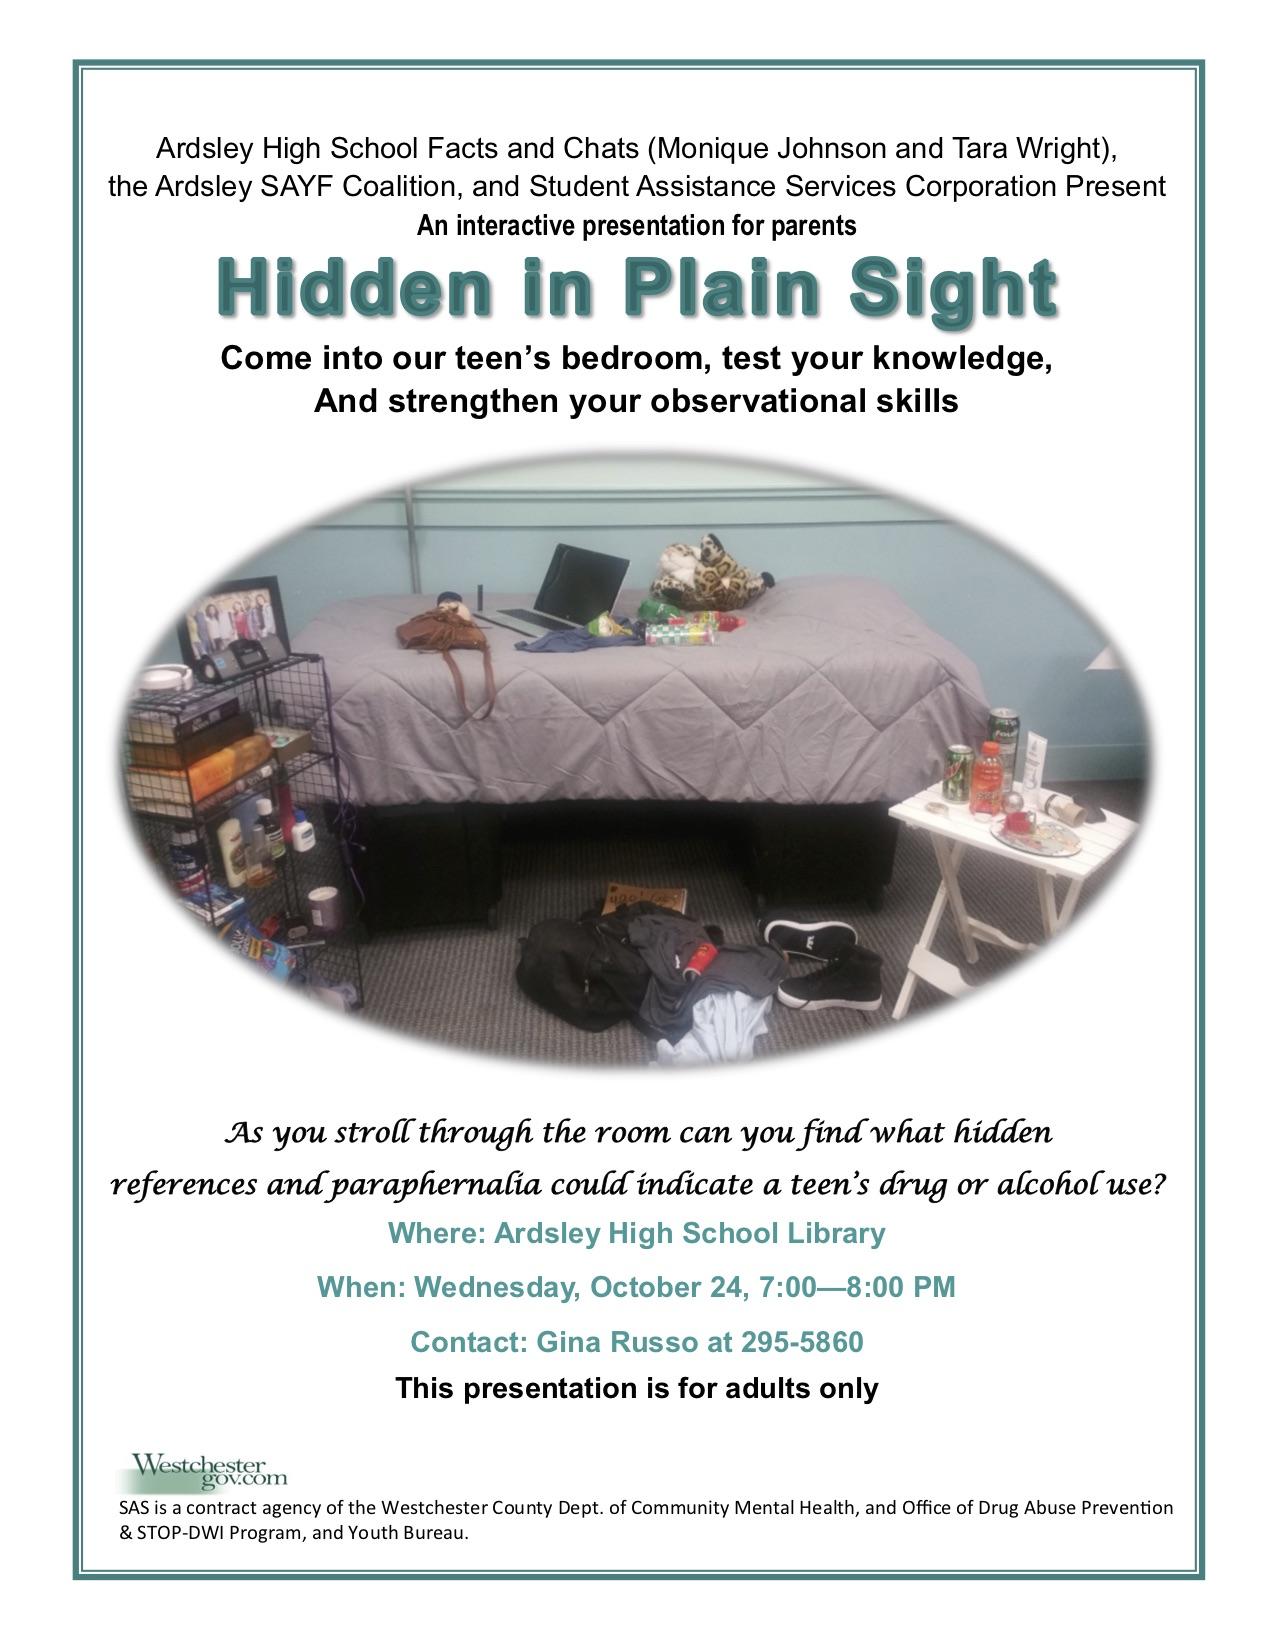 10-24-18 Hidden in Plain Sight Ardsley